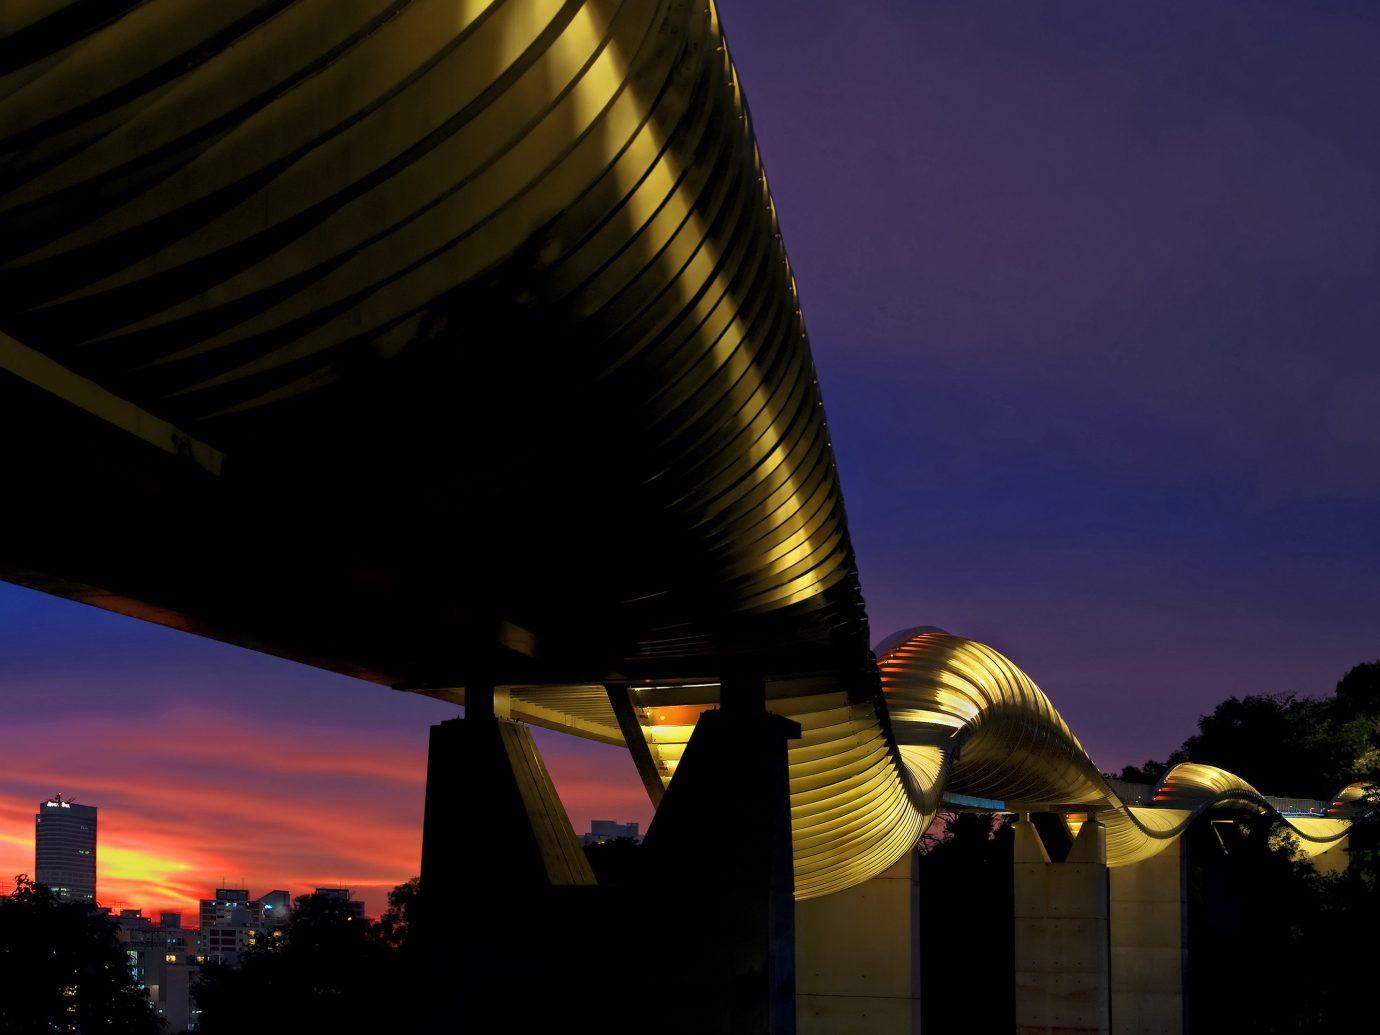 Offbeat Singapore Trip Ideas sky color outdoor night landmark City light evening Sunset urban area dusk atmosphere of earth cloud sunlight darkness morning reflection lighting skyscraper cityscape dawn